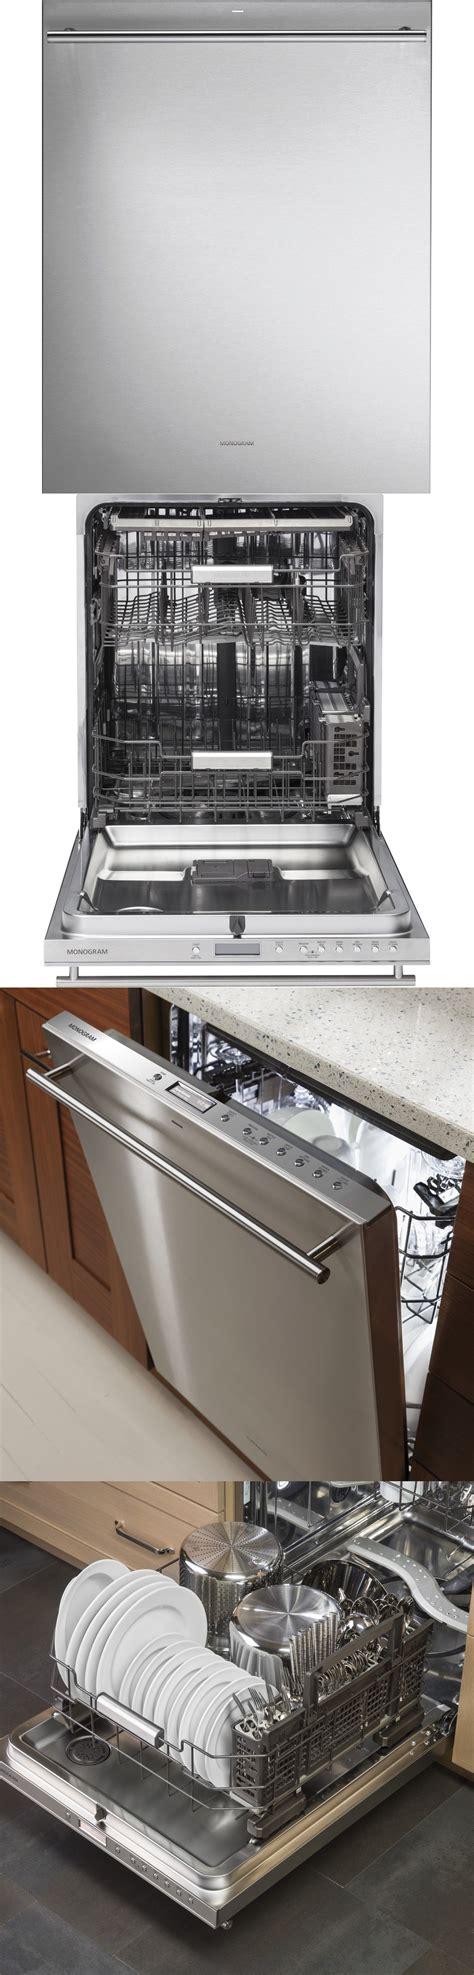 dishwashers  ge monogram zdtssjss fully integrated dishwasher stainless steel euro